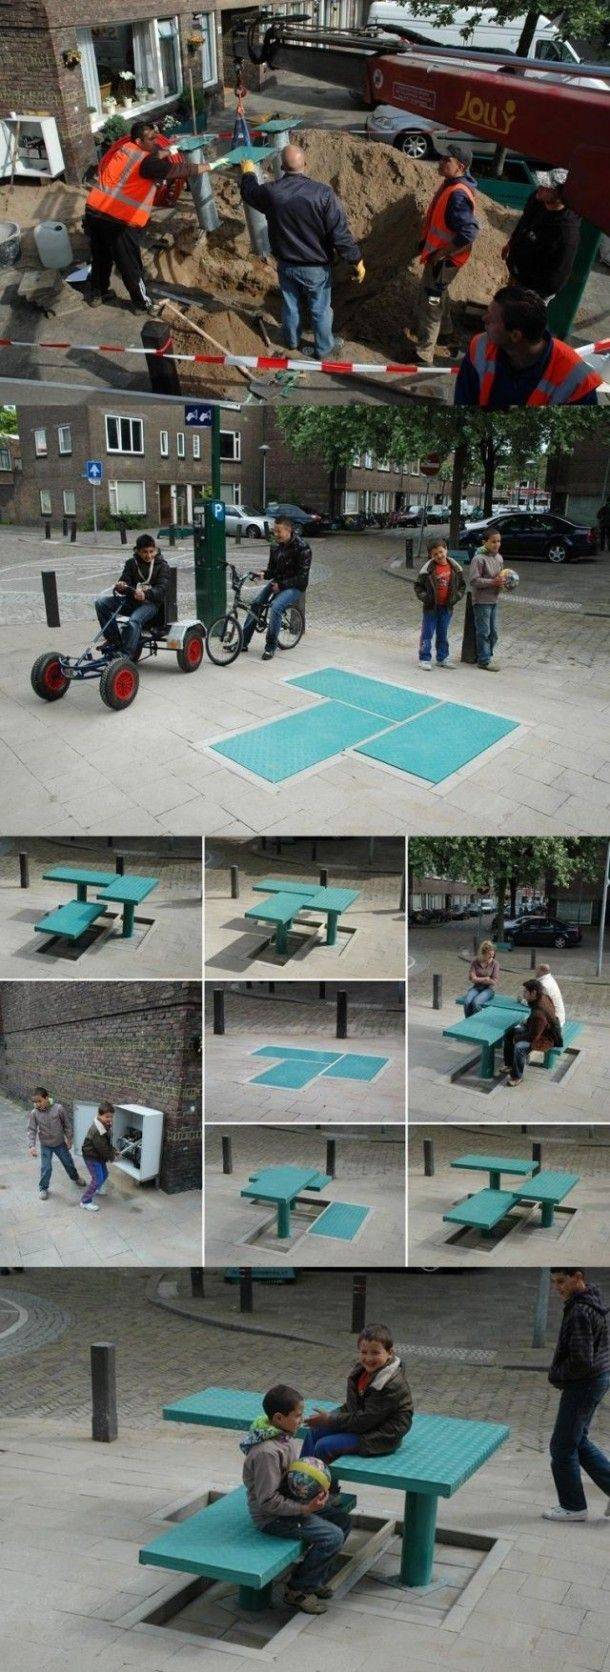 tetris-mobilier-urbain-610x1672